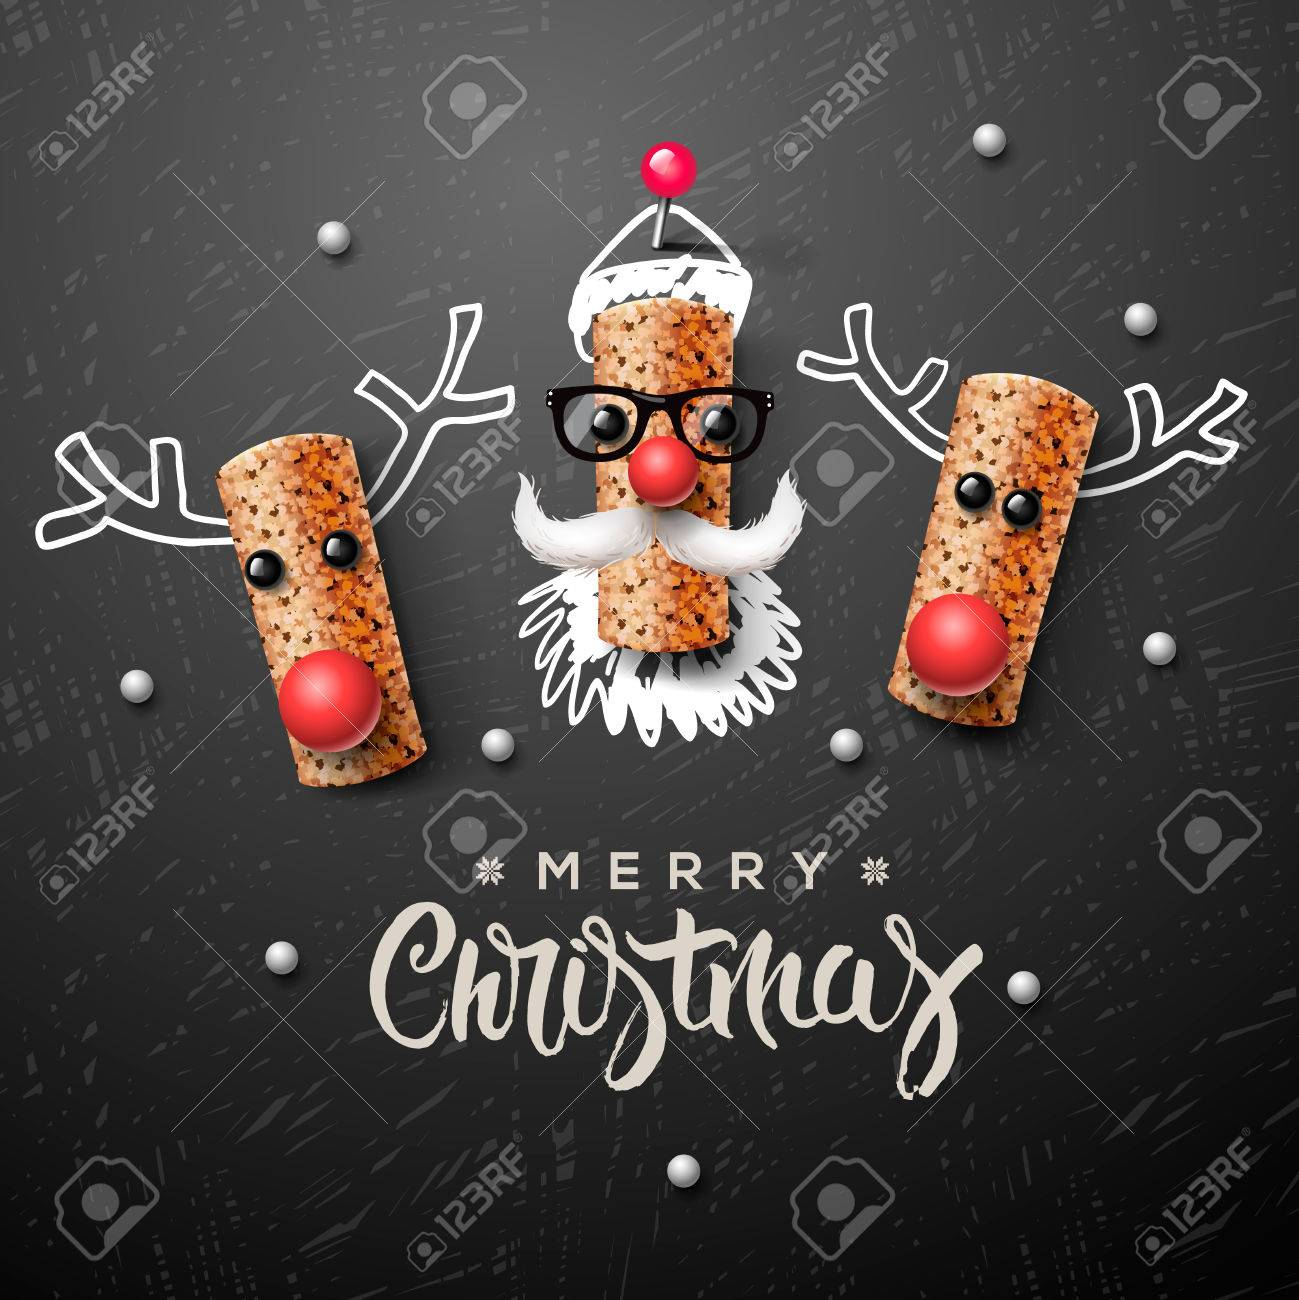 Santa Claus and reindeer made from wine cork Standard-Bild - 48425169